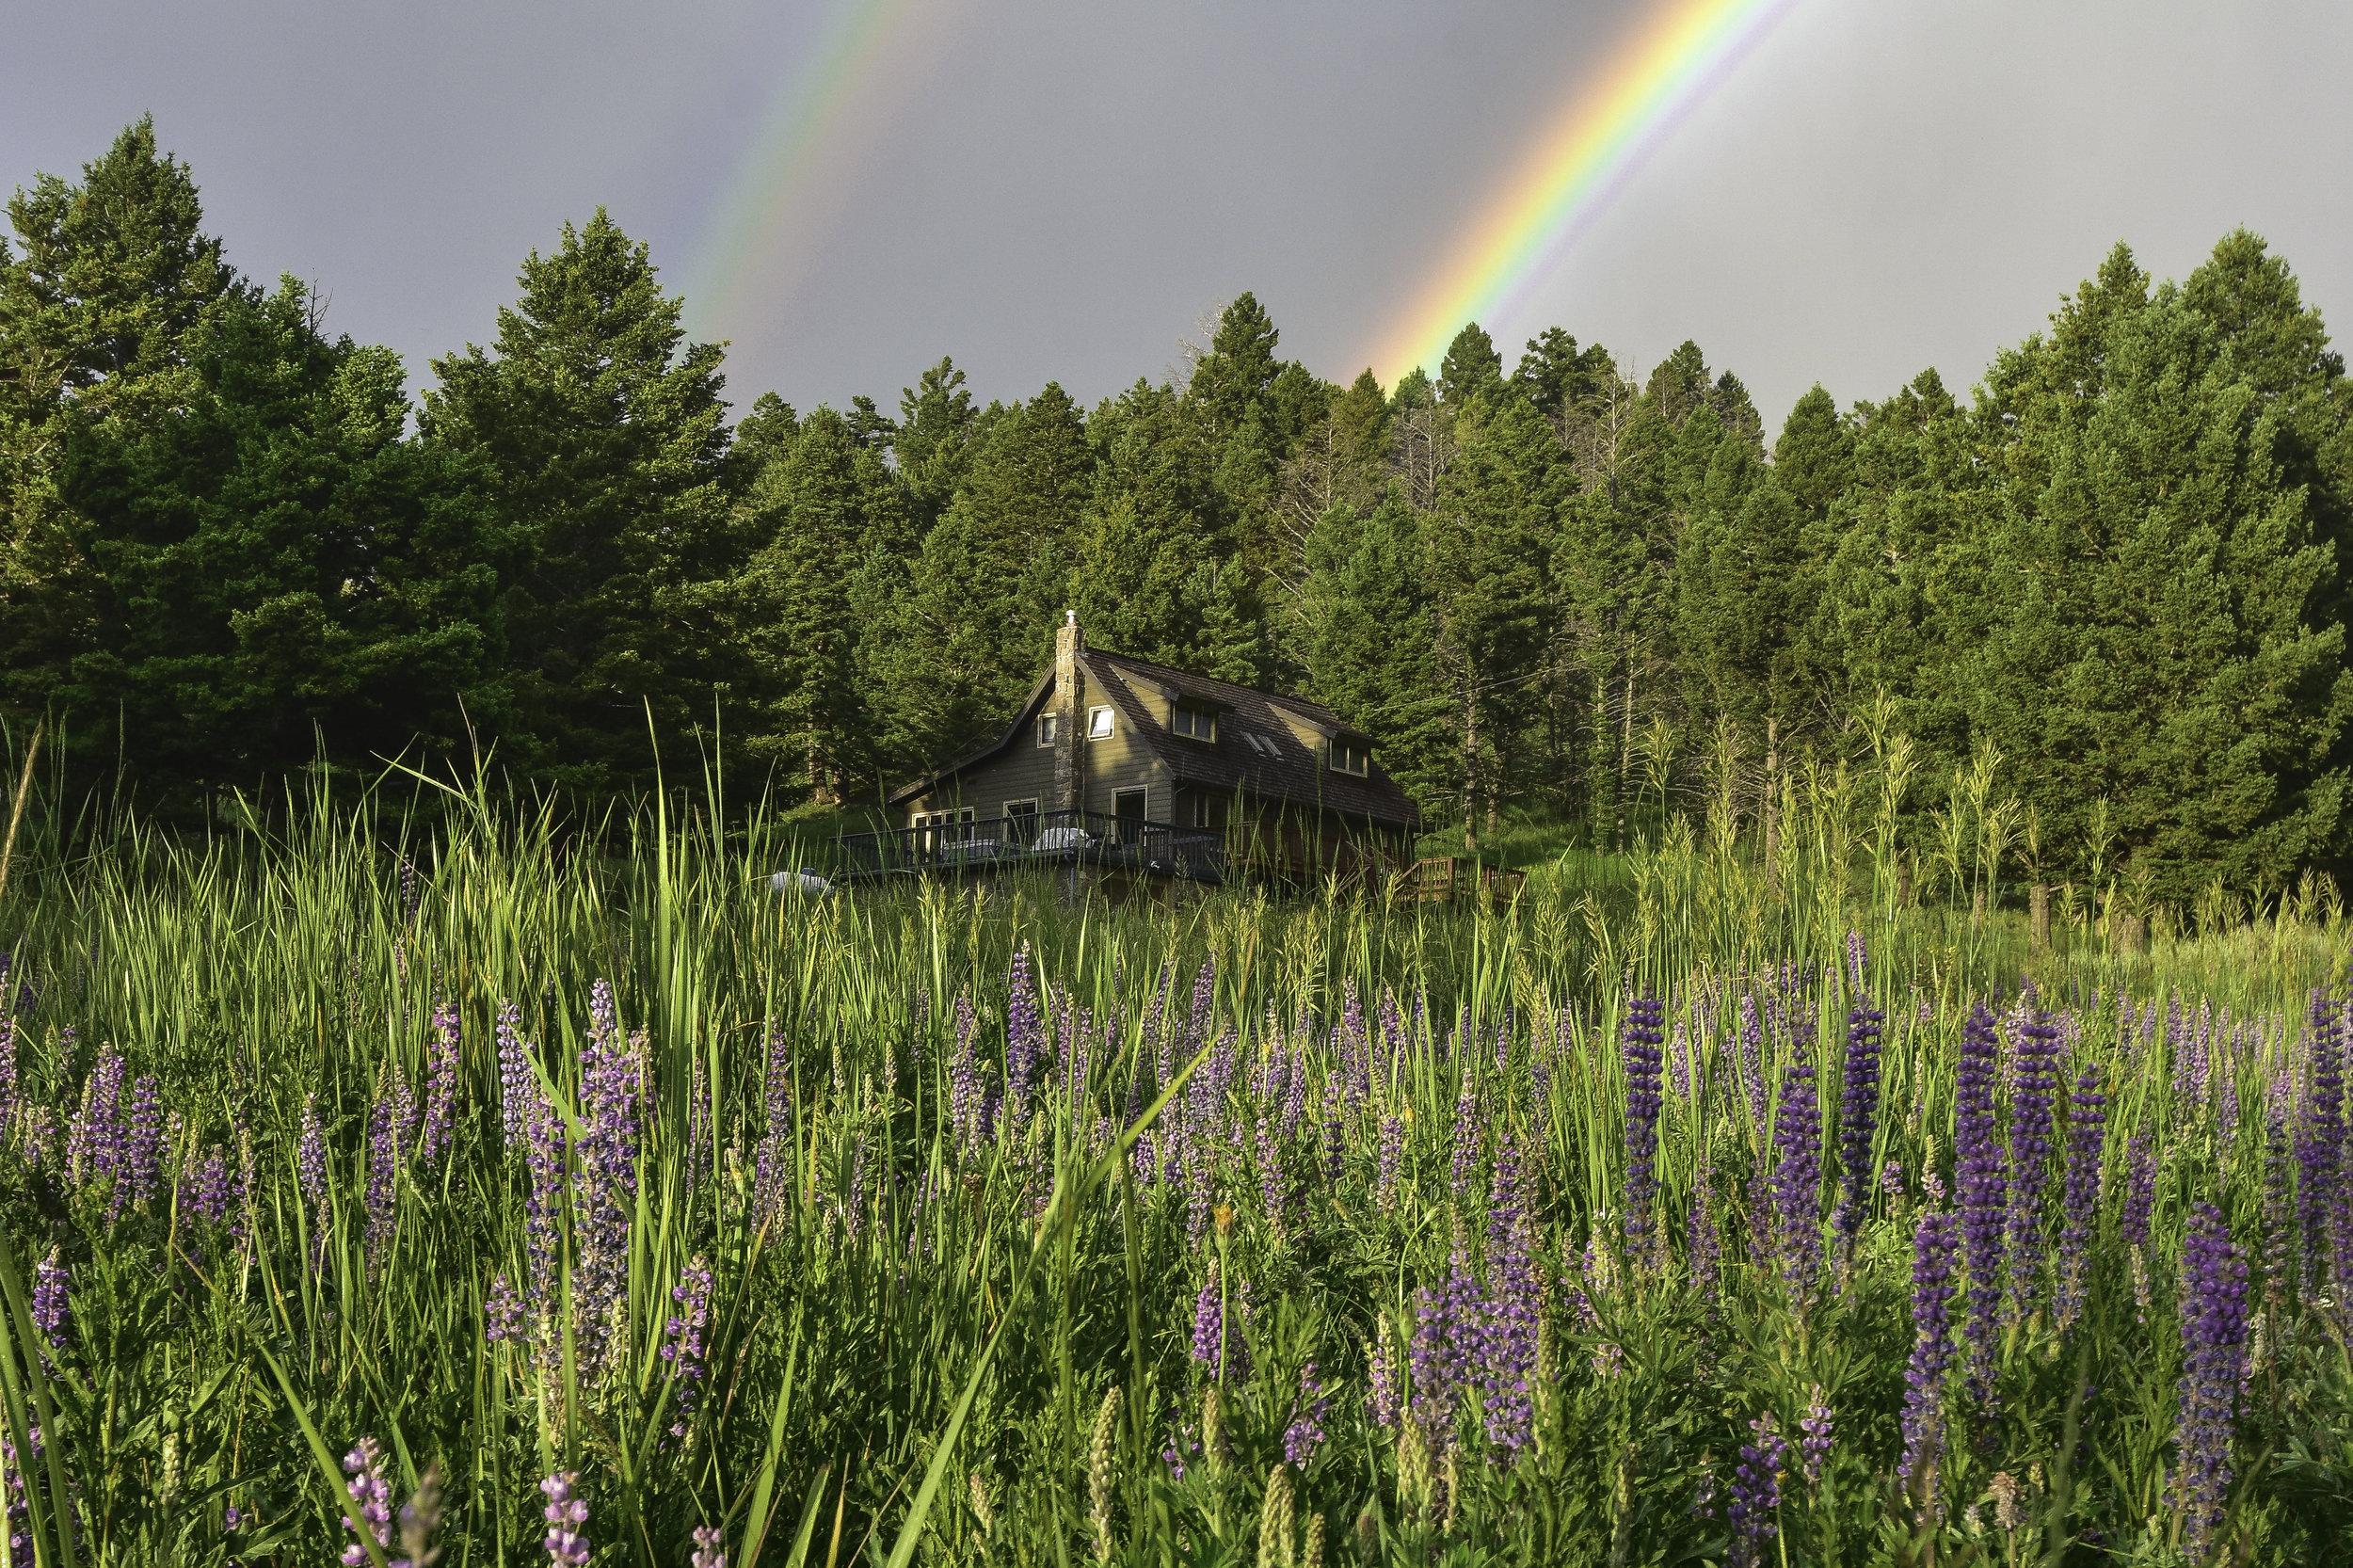 The Montana House / Jeremiah Cunningham